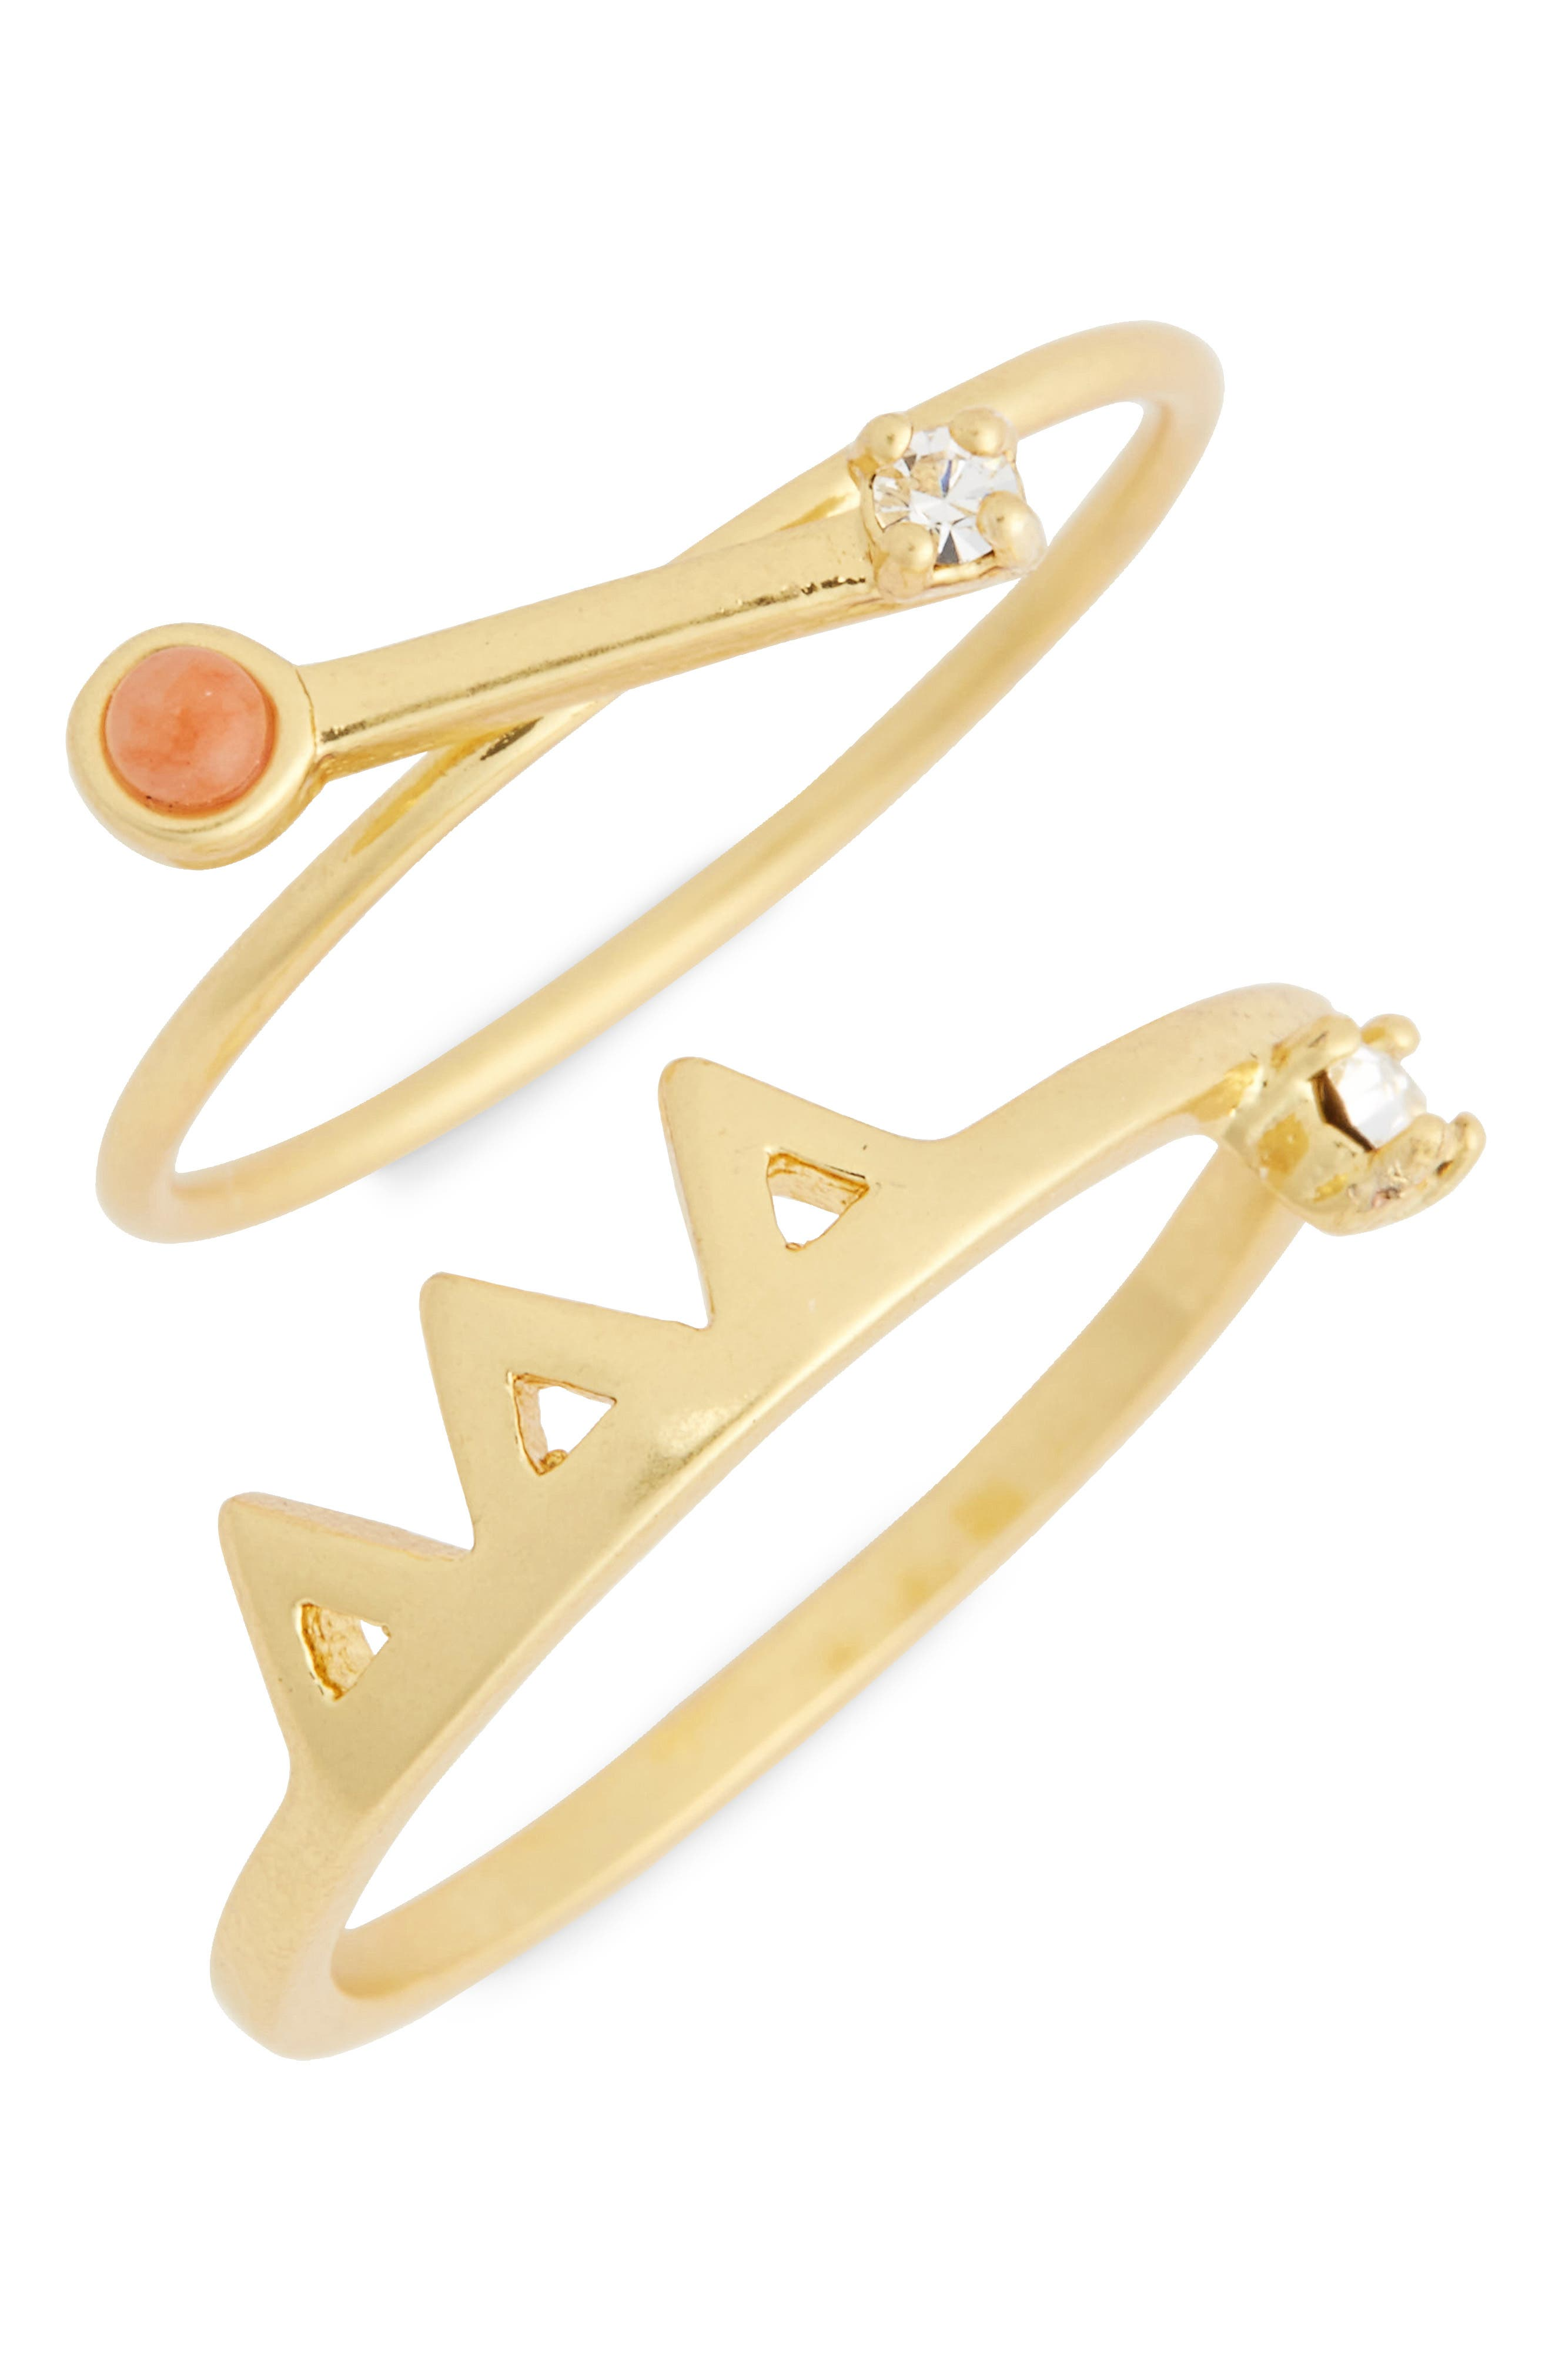 Madewell Pink Jade Ring Set